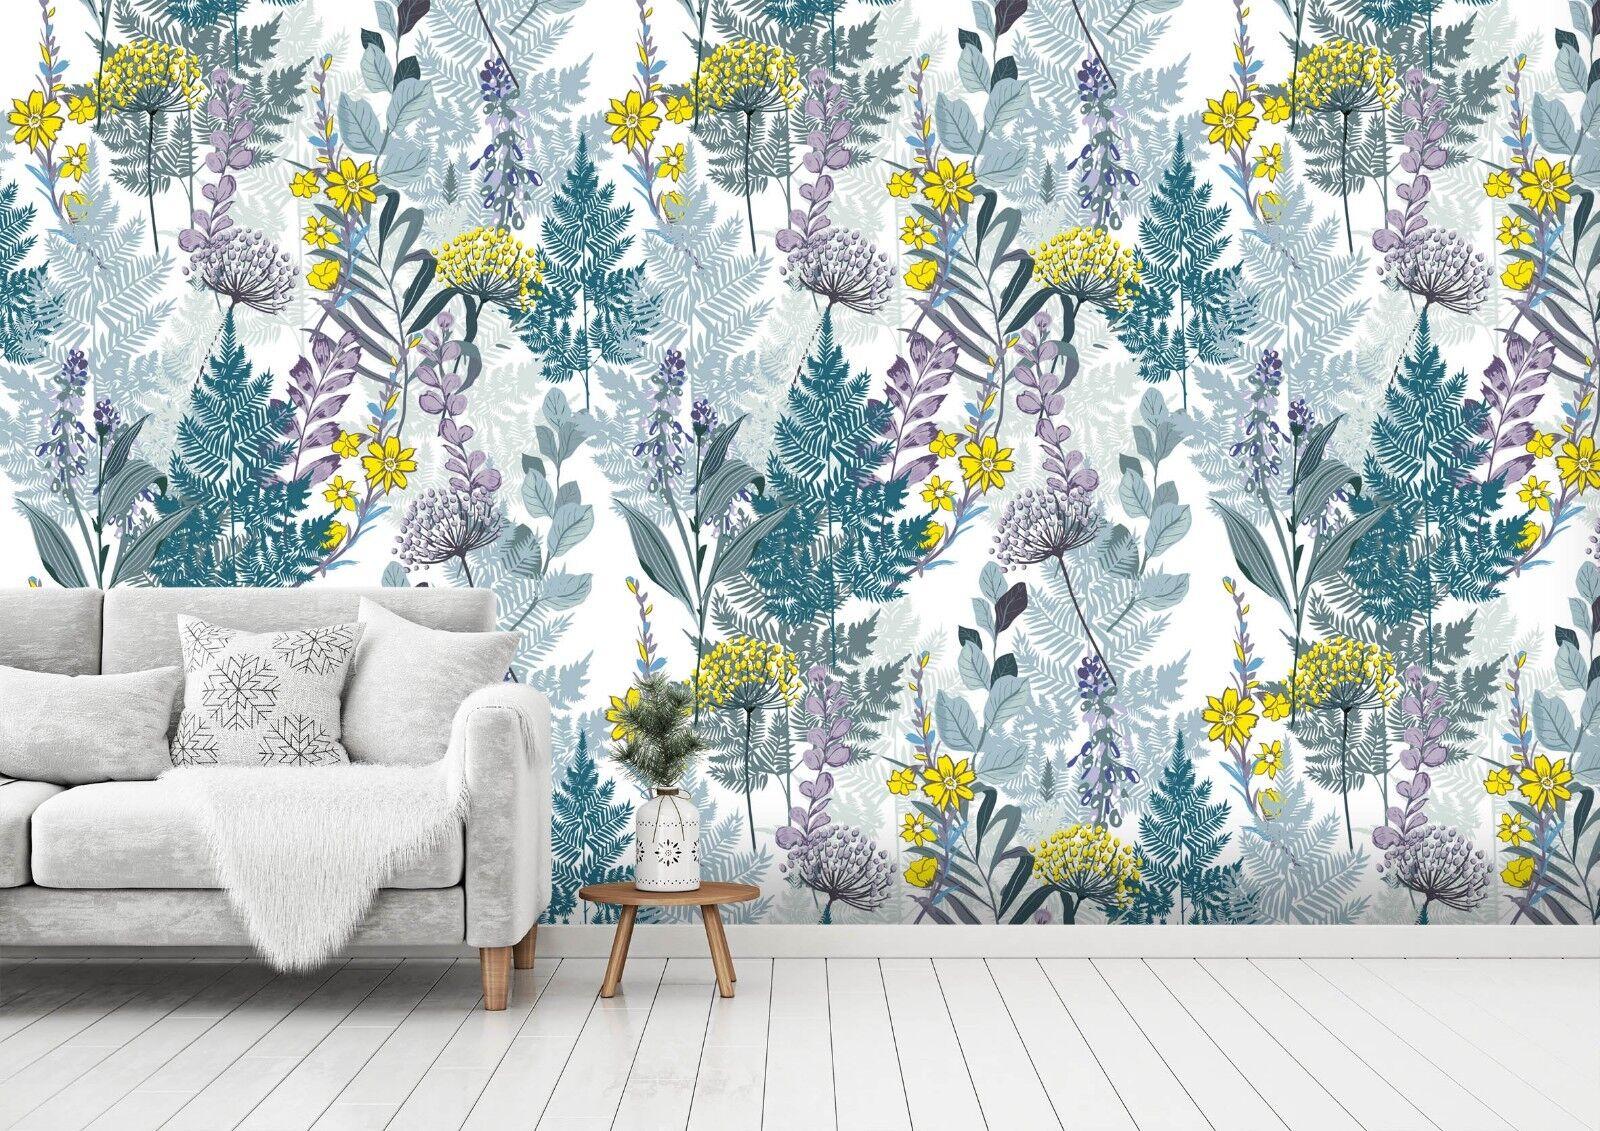 3D Gelb Petals Garden 455 Wall Paper Wall Print Decal Wall Deco Indoor Murals